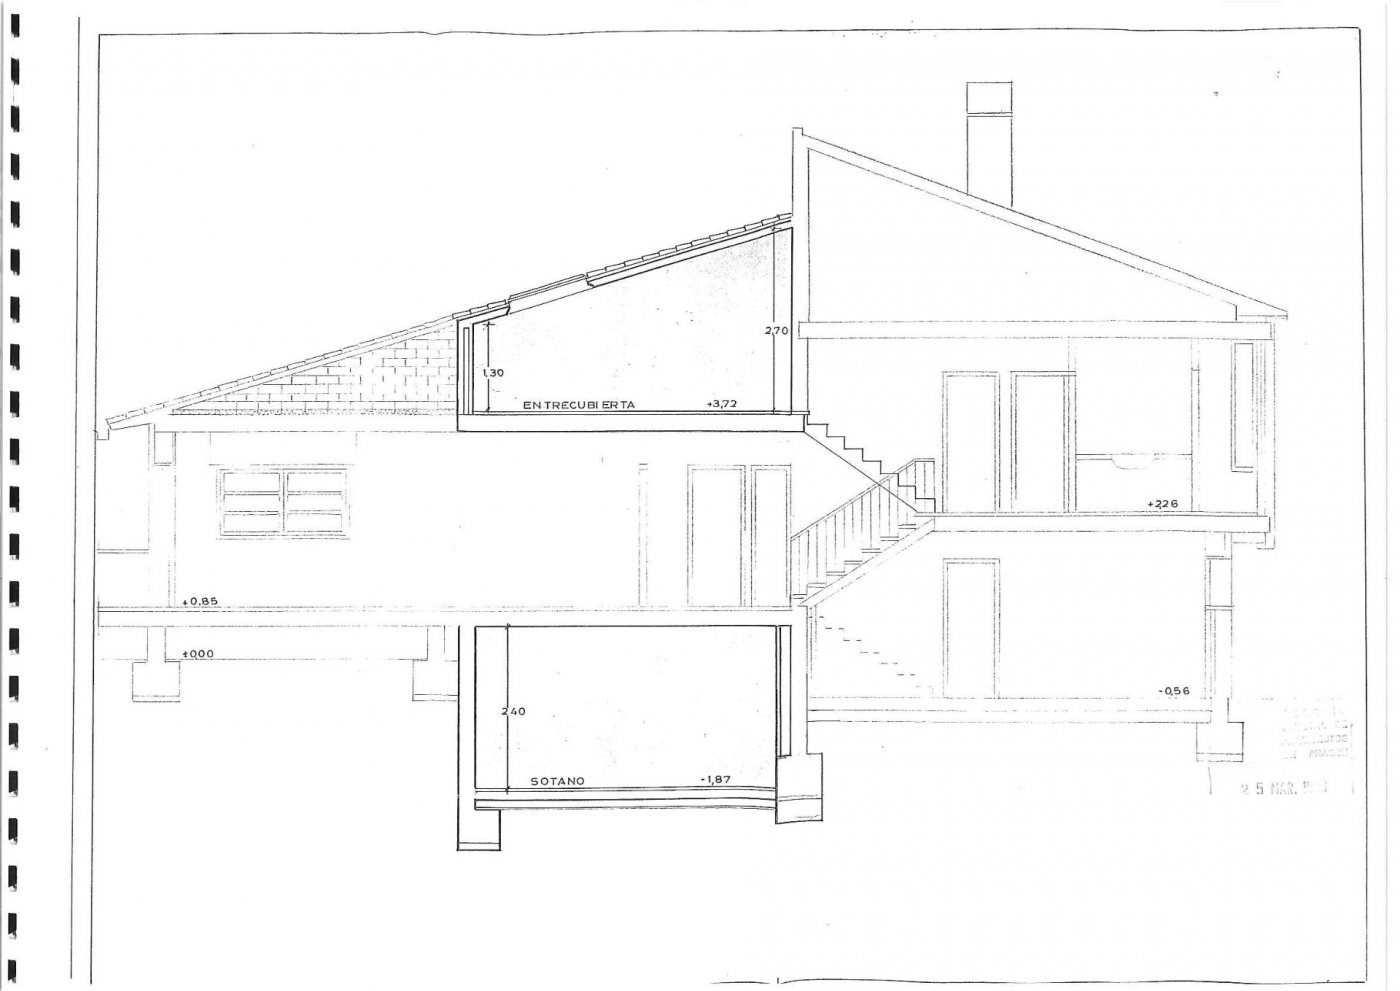 Parcela lateral de 600m2 con casa de 267m2 útiles  de vivienda mas garaje anejo de 45m2 út - imagenInmueble34